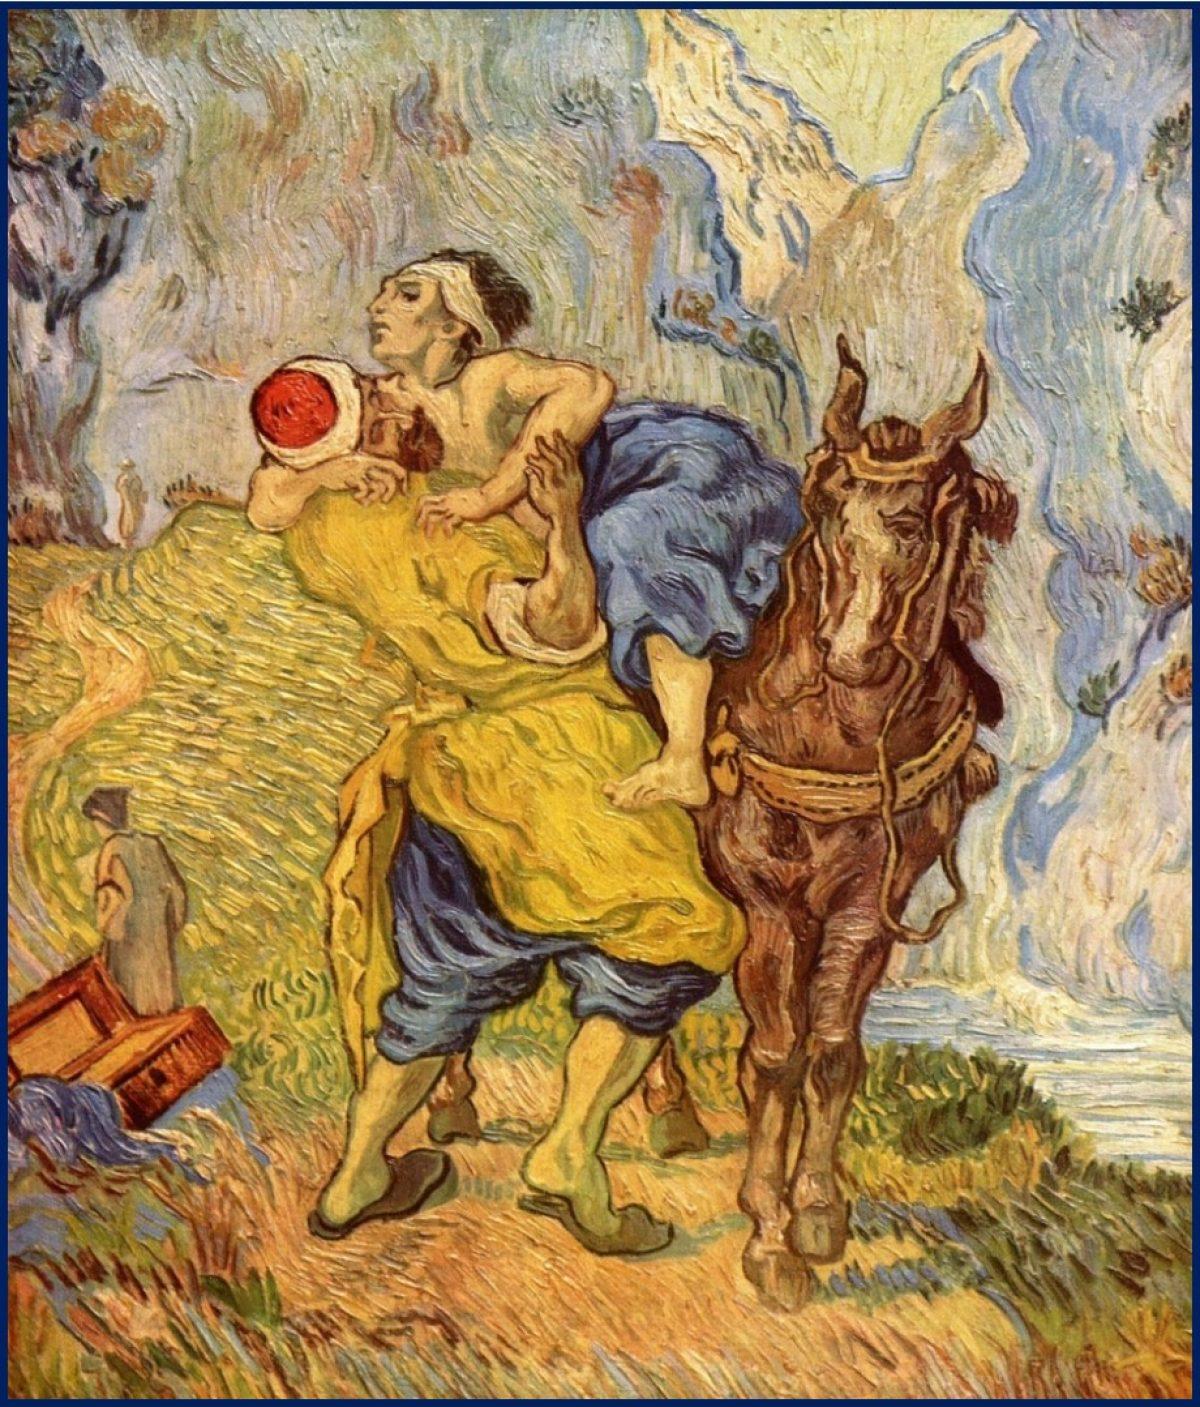 VINCENT VAN GOGH: UN DRAMMATICO INNO ALLA VITA